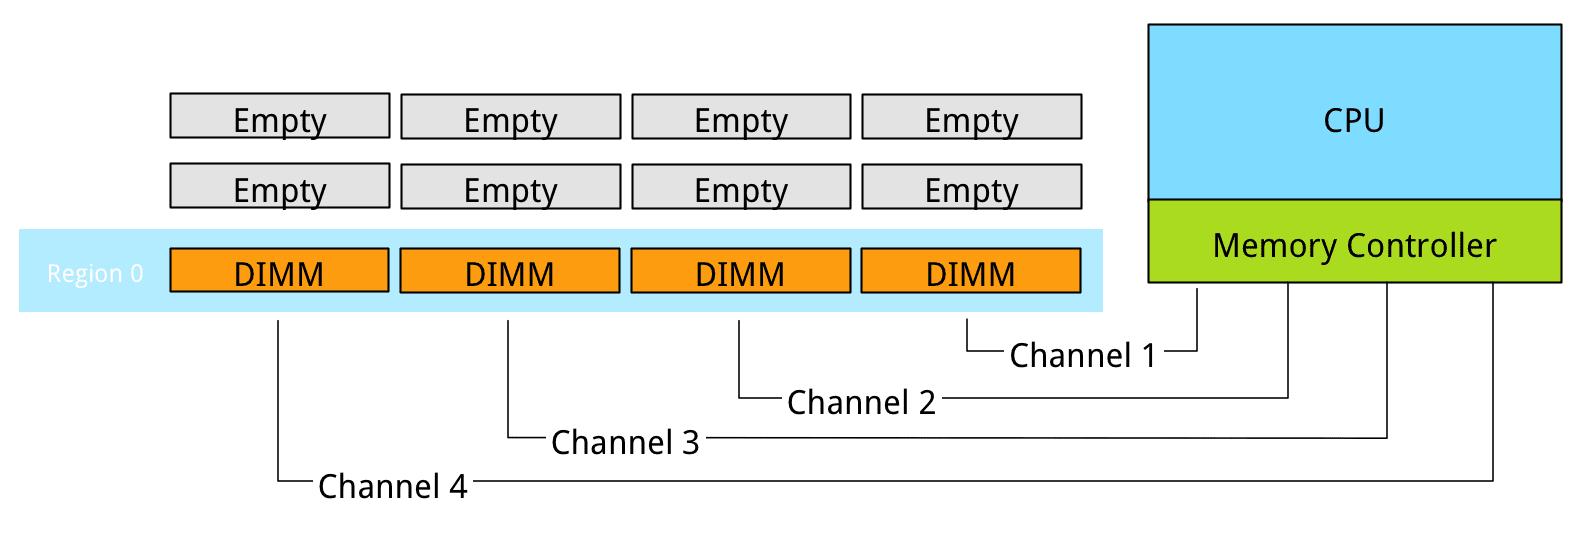 Cpu Processor Imc Memory Interleaving Region